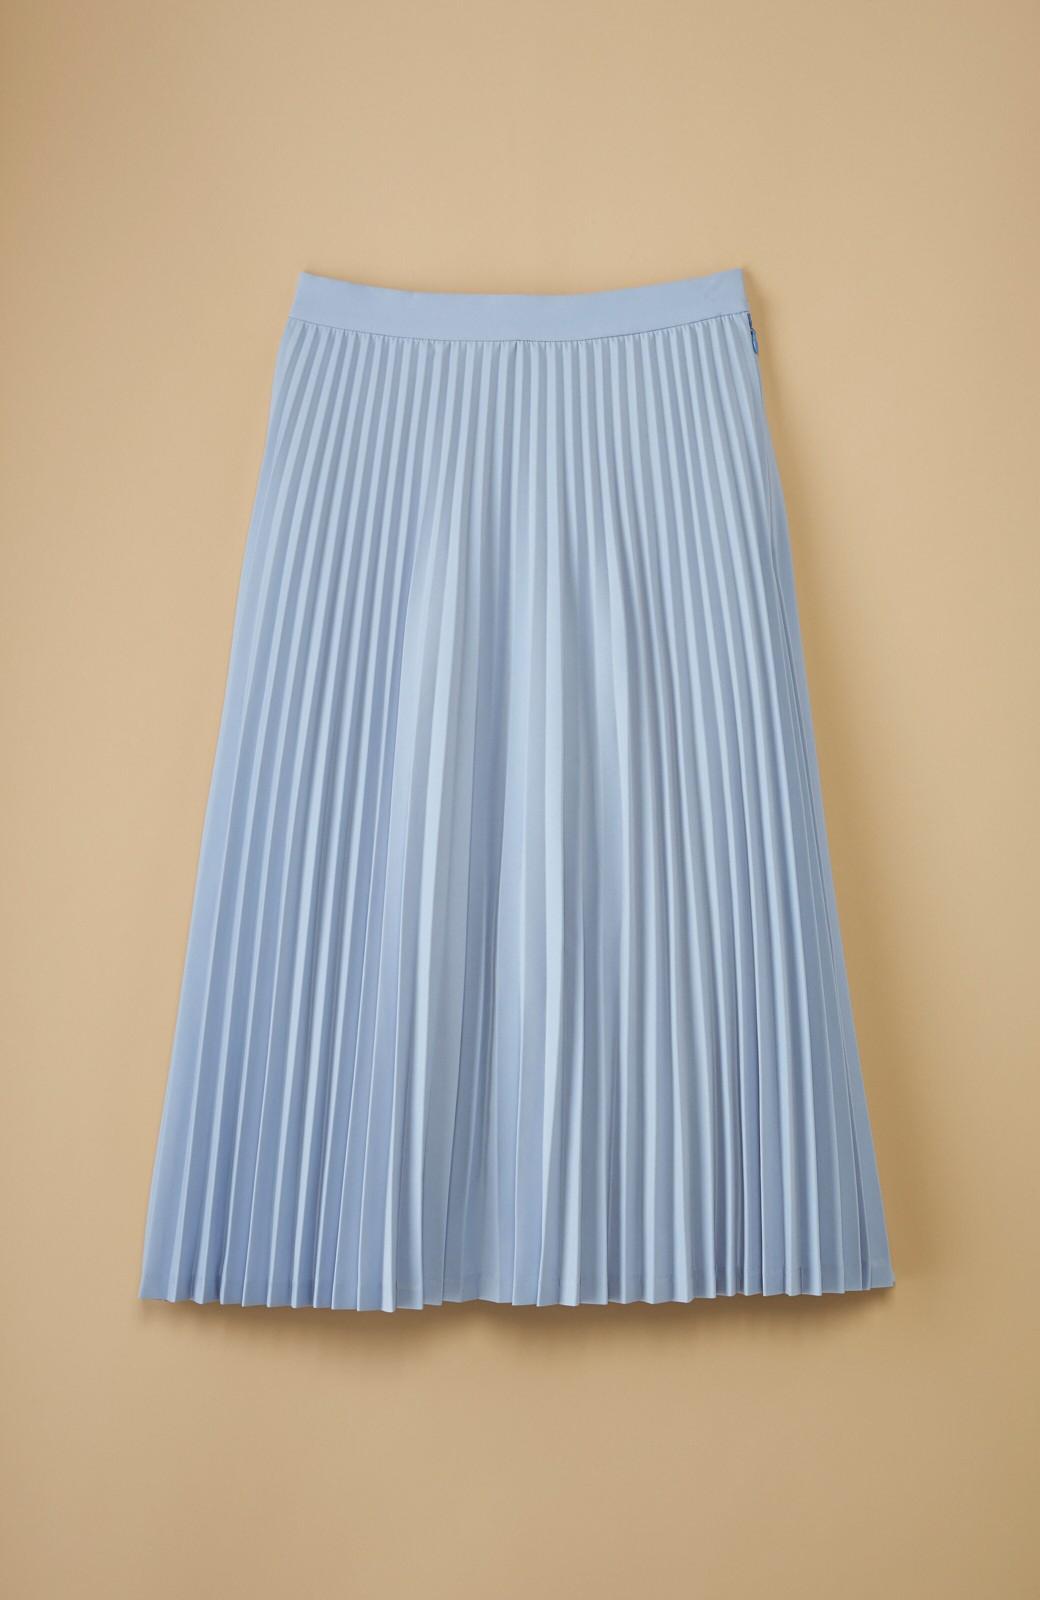 haco! 【mer11月号掲載】折り目正しい大人のためのプリーツスカート by que made me <サックスブルー>の商品写真1